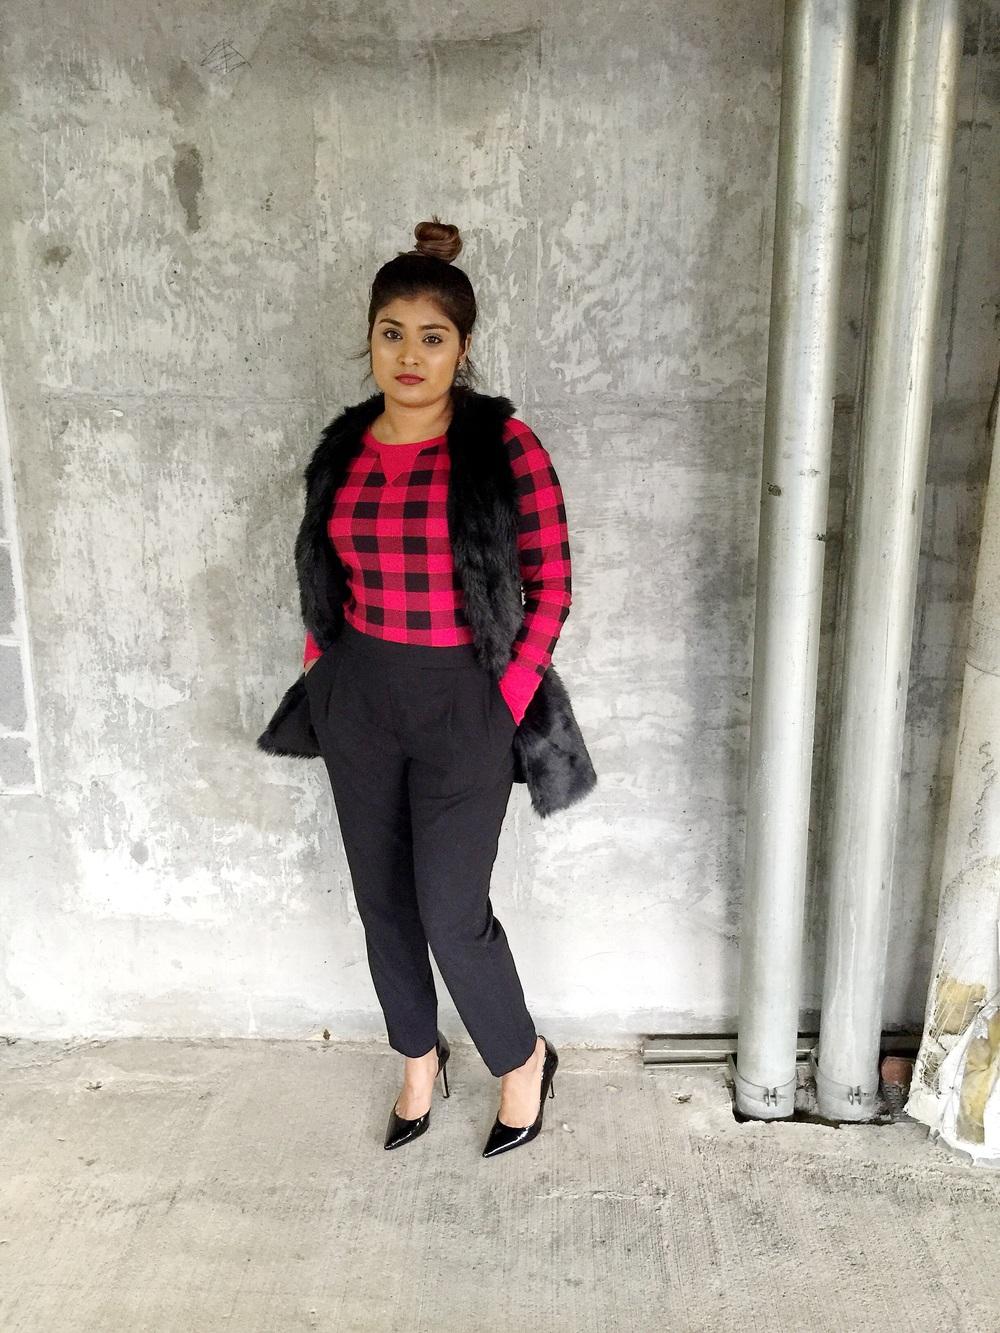 Top Bun, Faux Fur + Plaid | Fashion Blogger - by: Vashti Co.